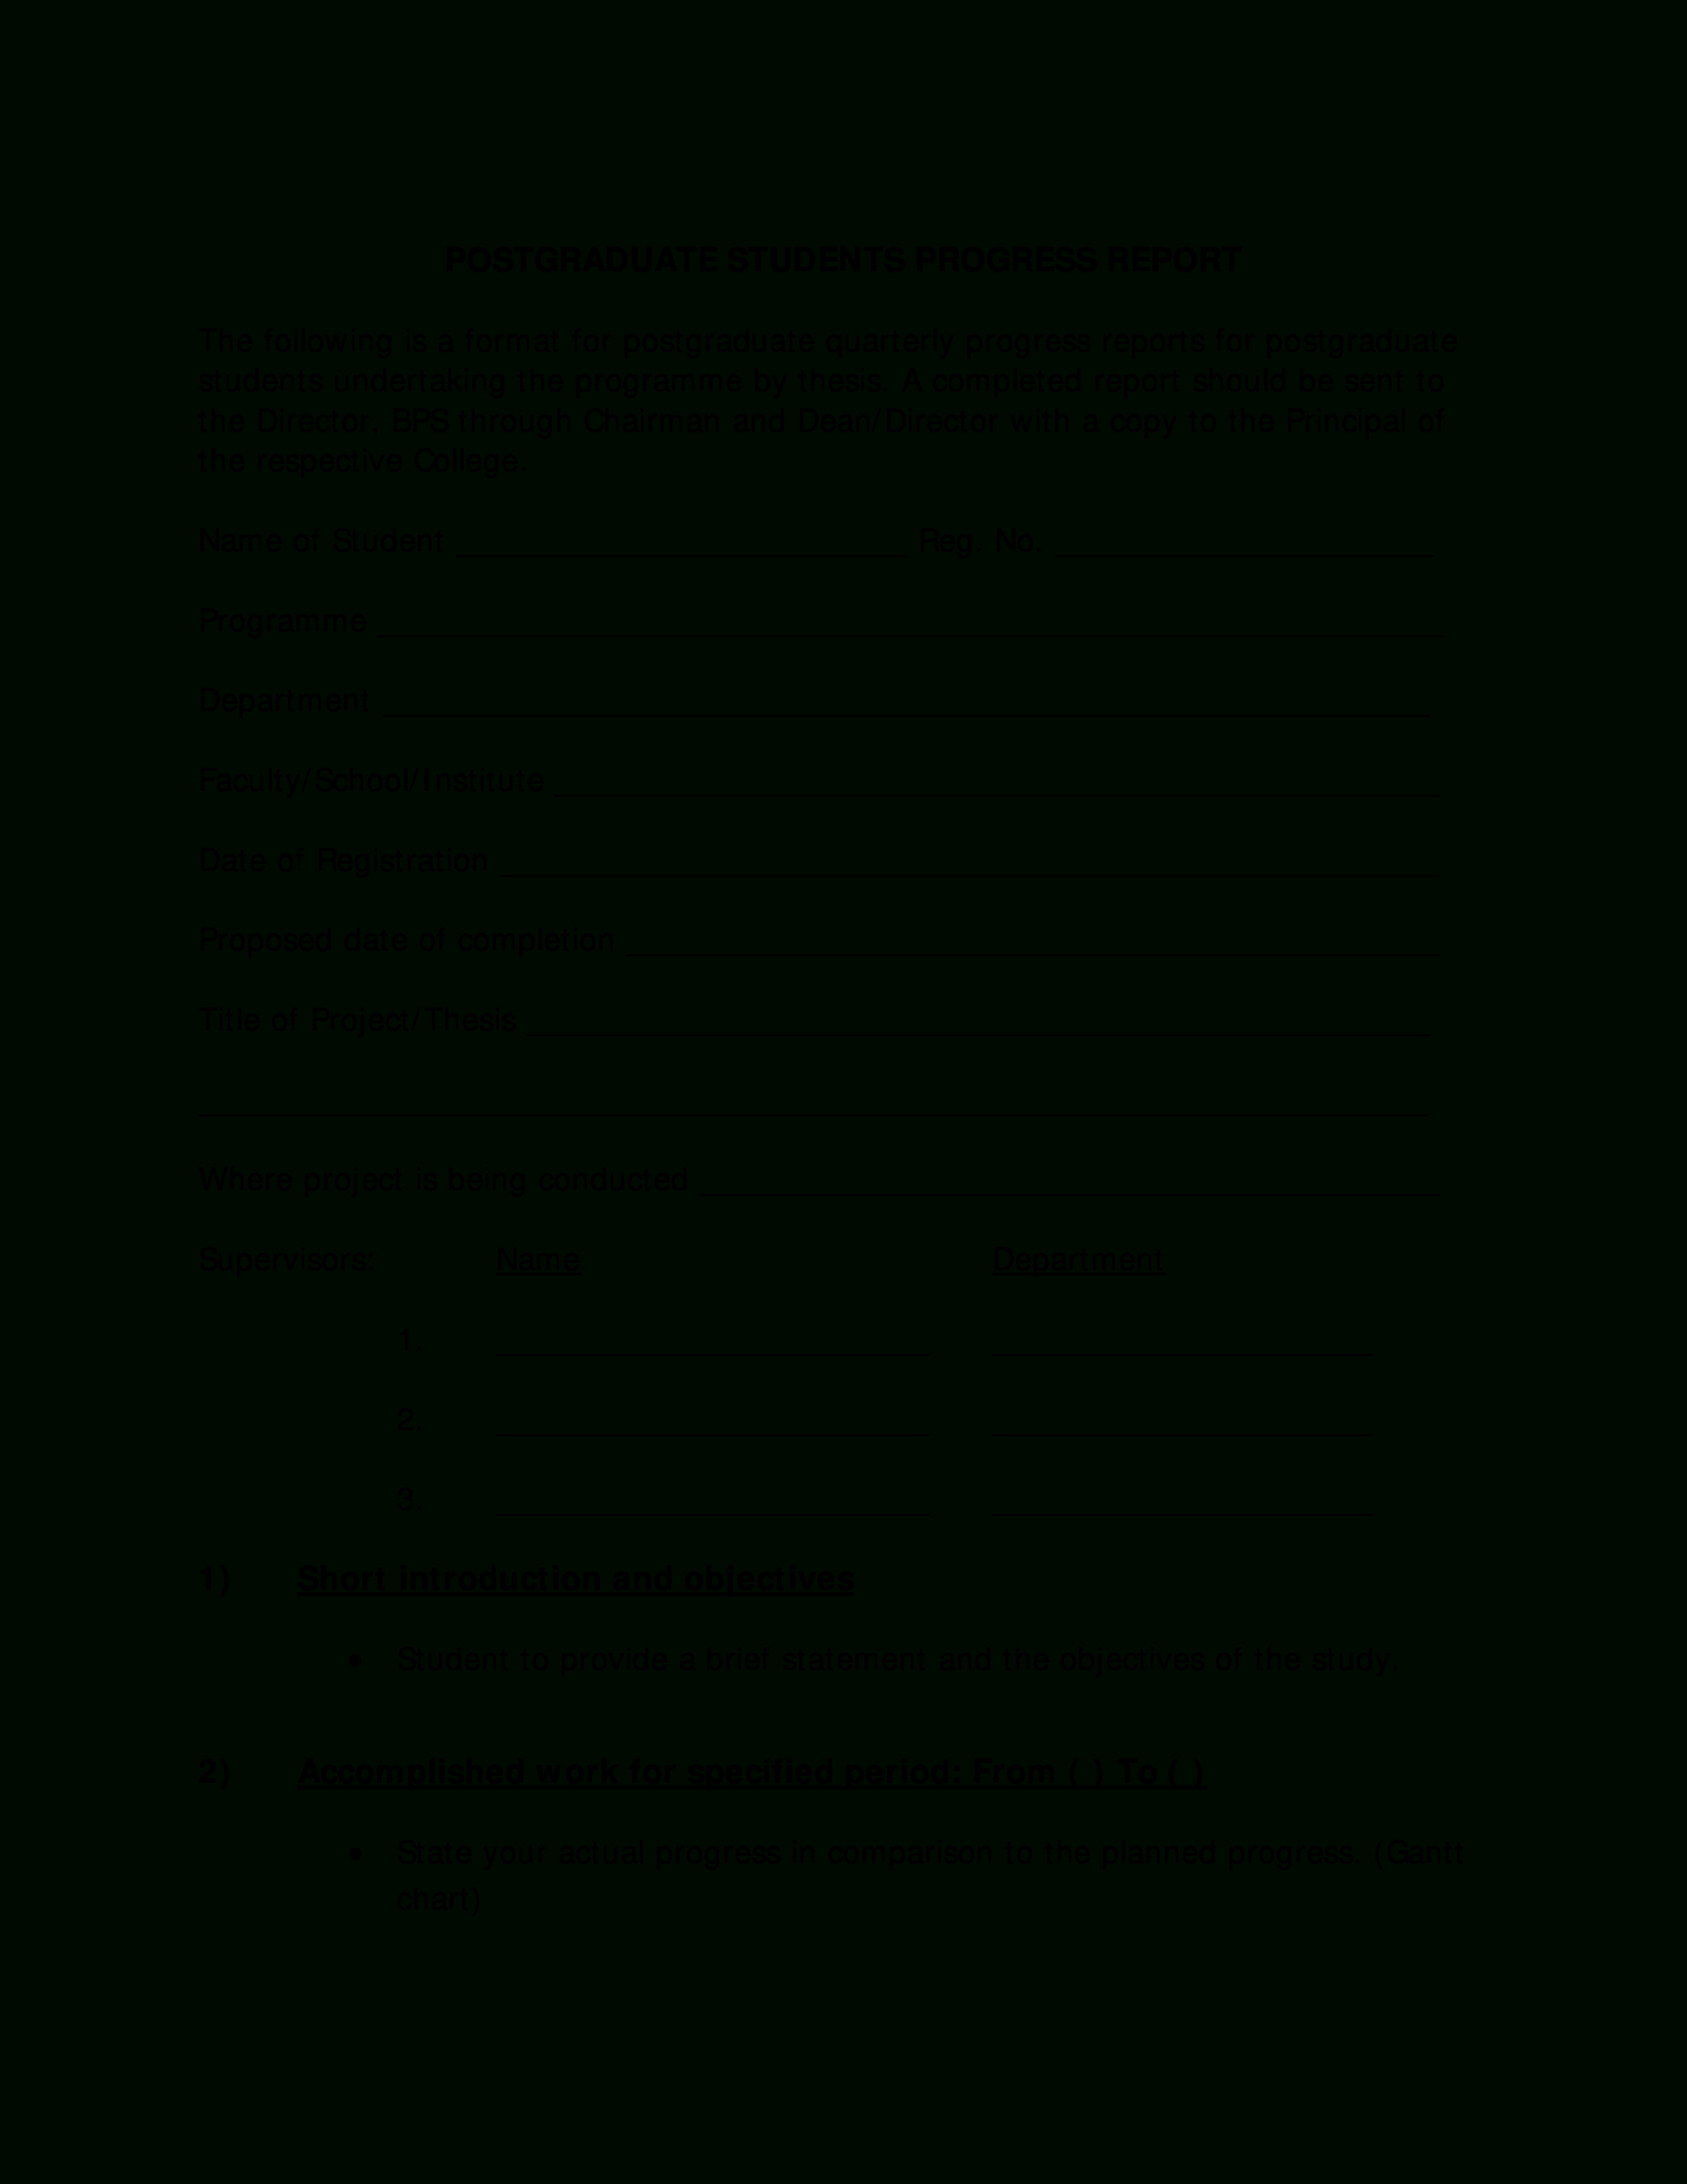 Student Progress Report Example | Templates At pertaining to Educational Progress Report Template